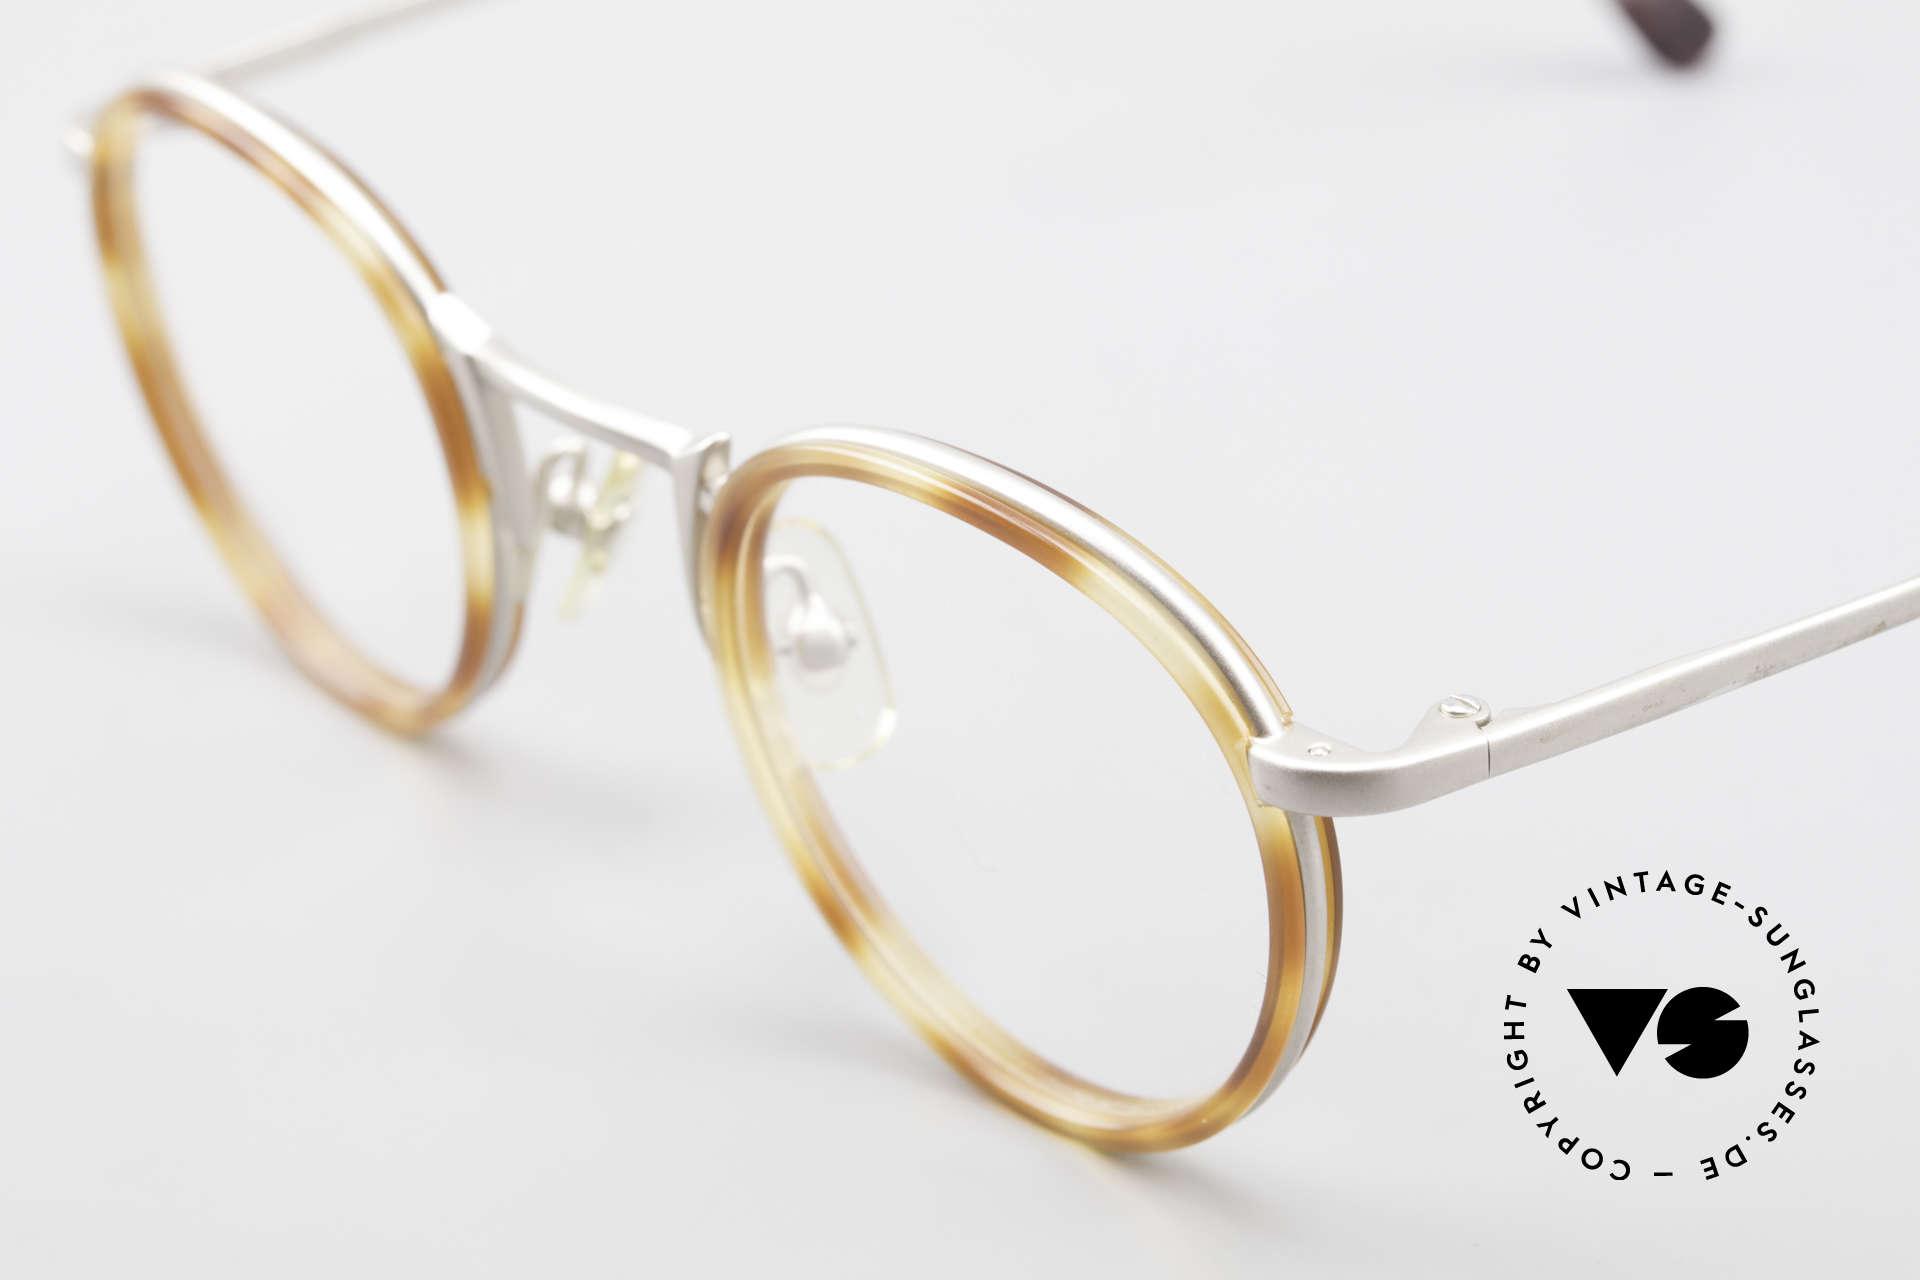 Freudenhaus Bido Round 90's Designer Frame, timeless & sophisticated frame design; SMALL size, Made for Men and Women